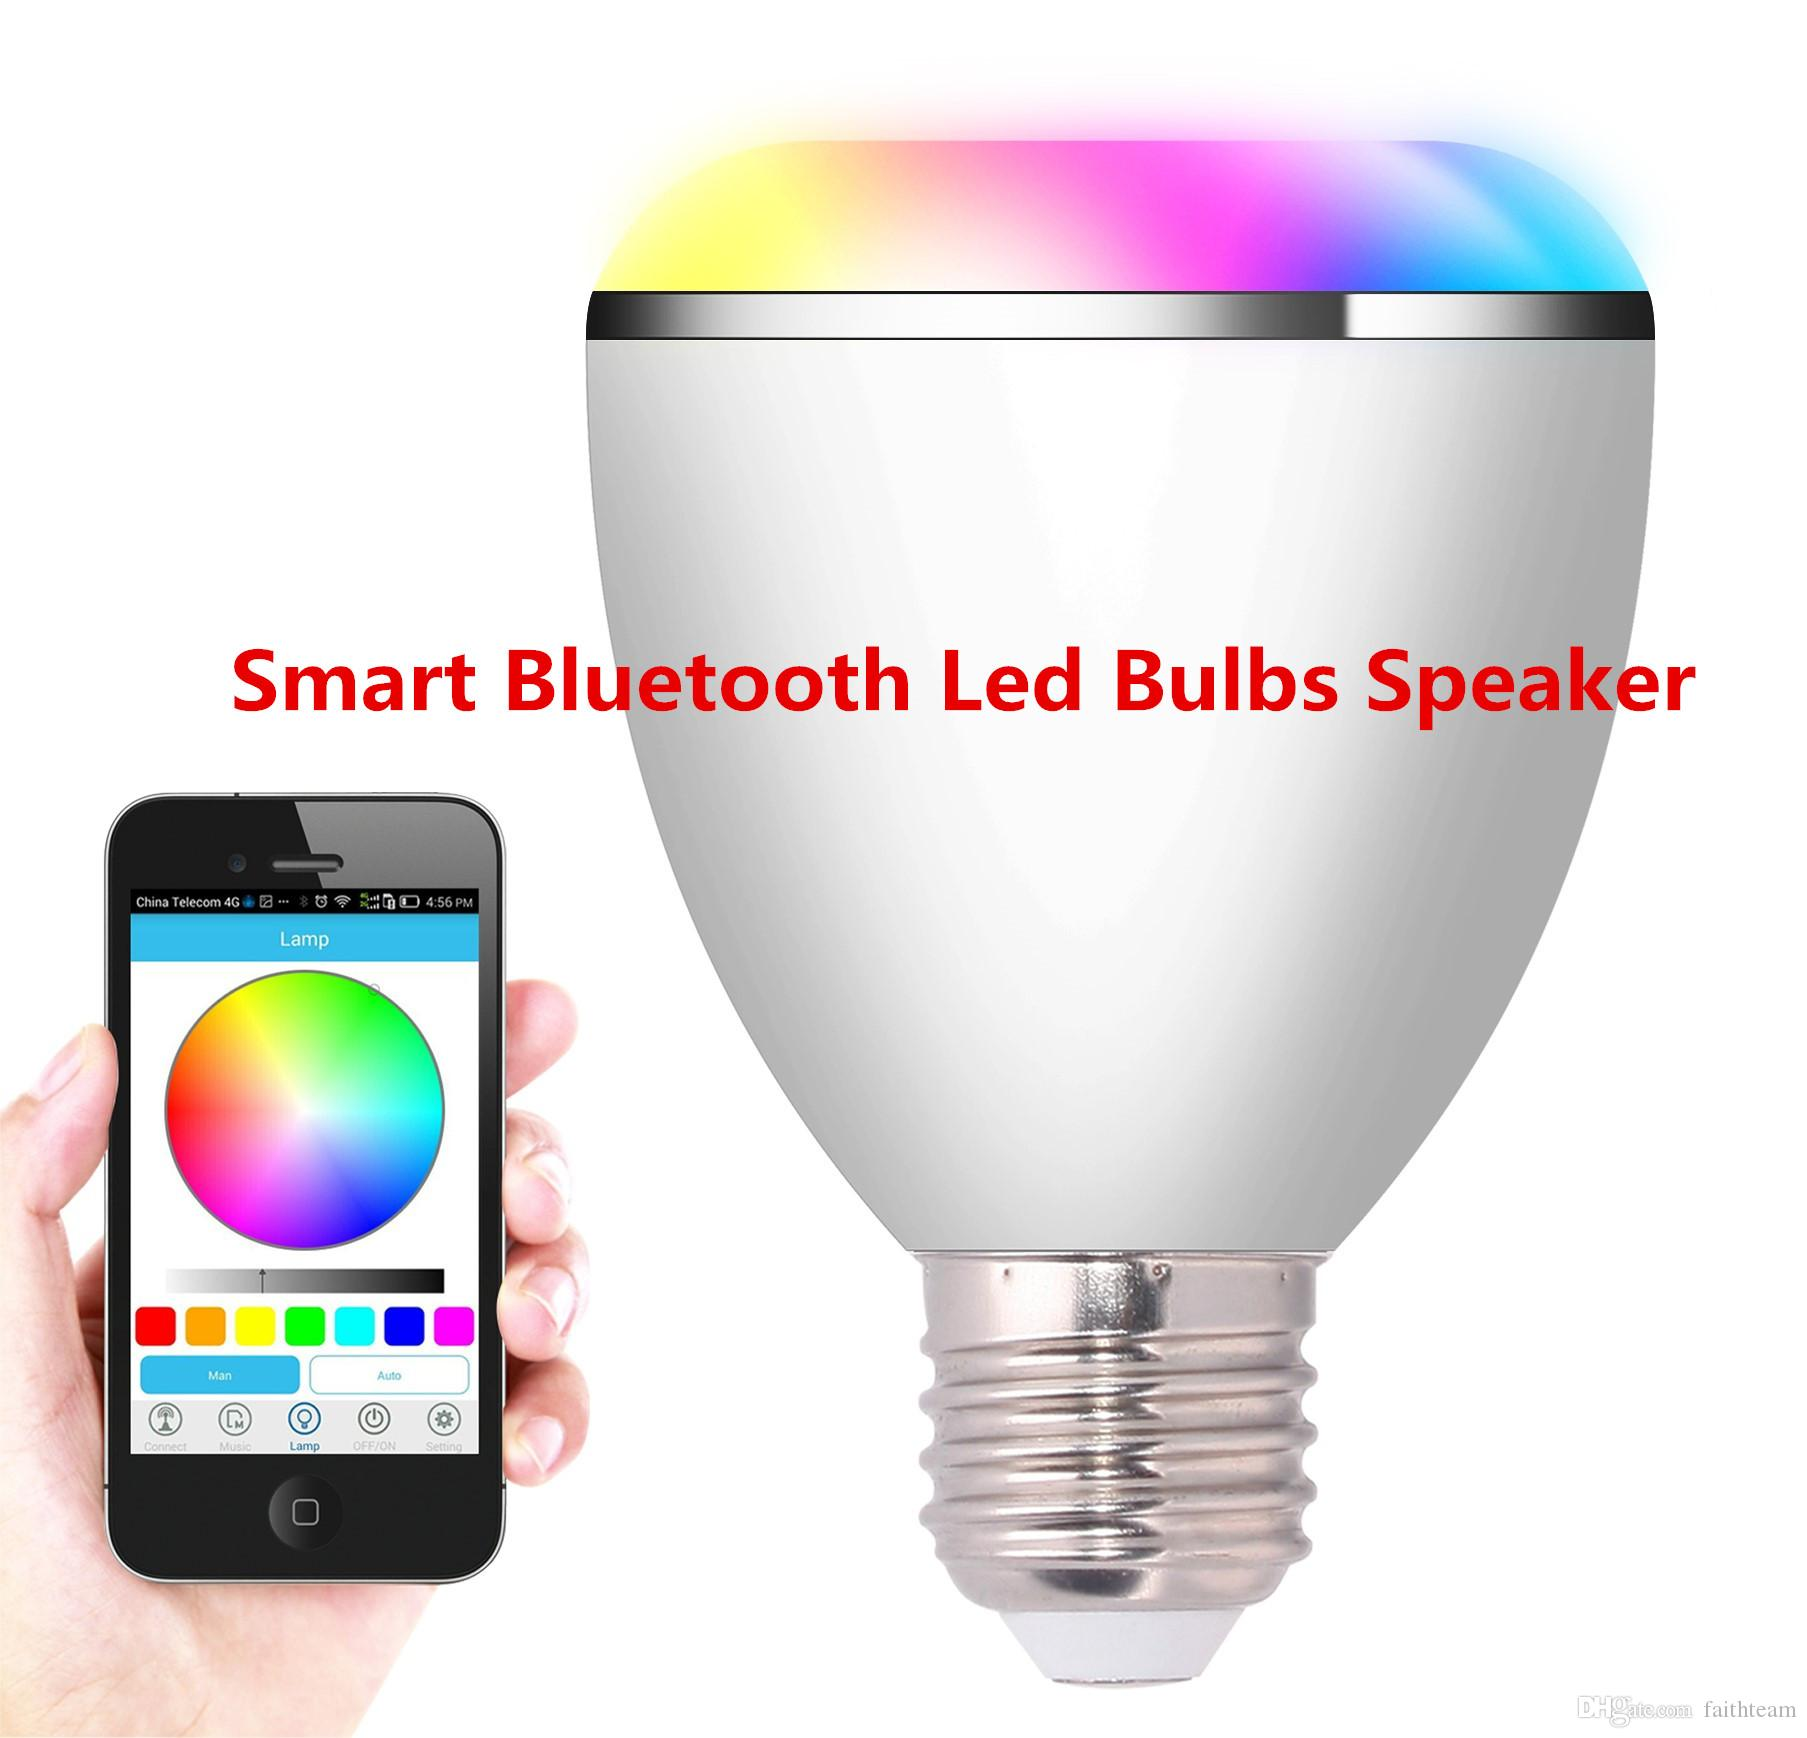 Smart Bluetooth Led Bulbs Speaker 6w Blubs And 3w Speaker